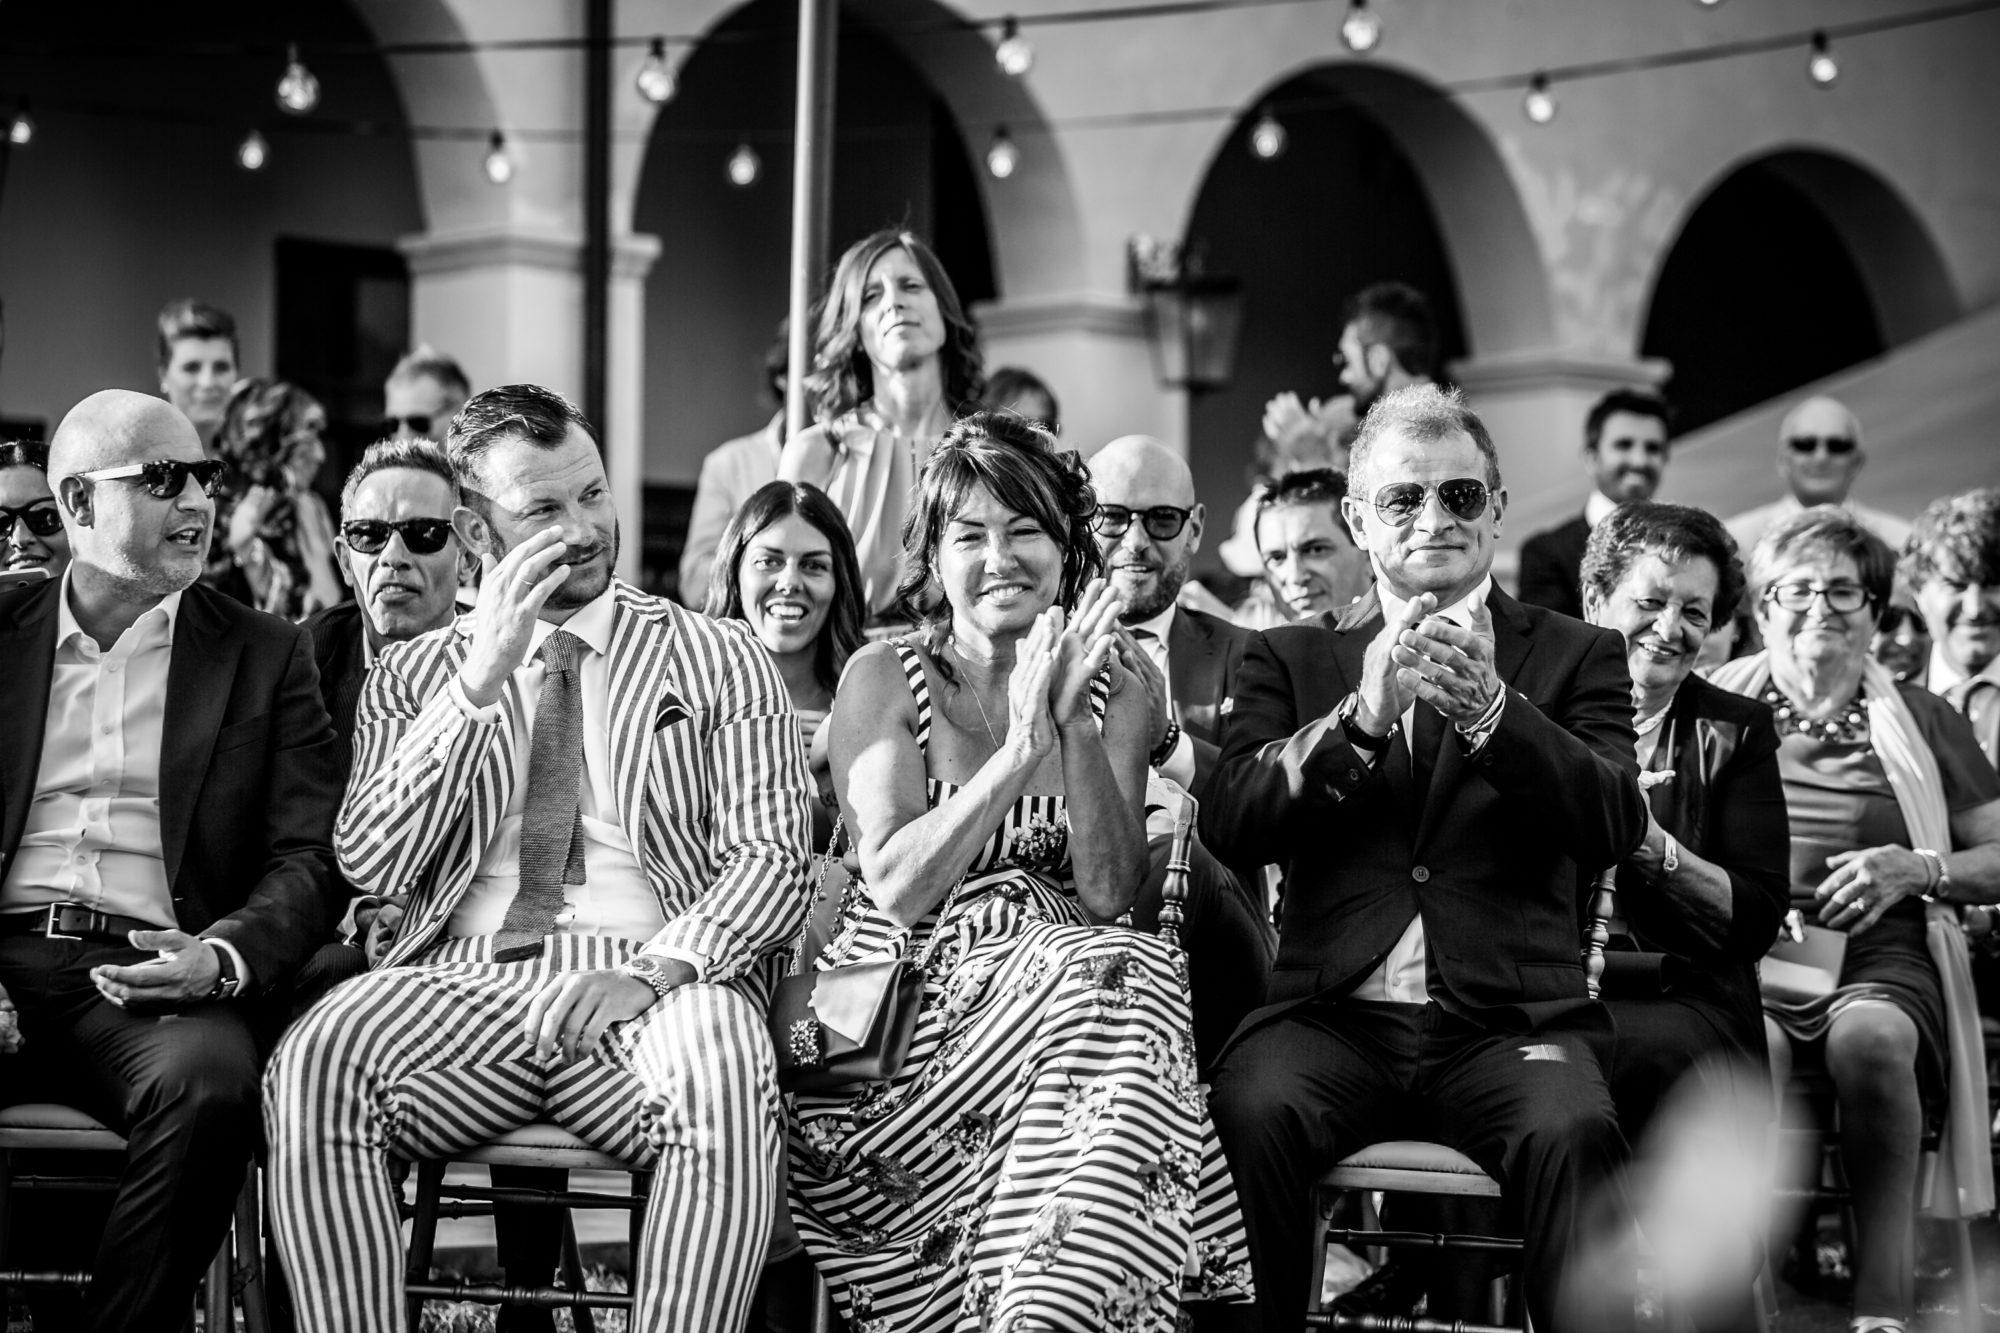 0019_gilberti_ricca_castello_oldofredi_montisola_fotografi_matrimonio